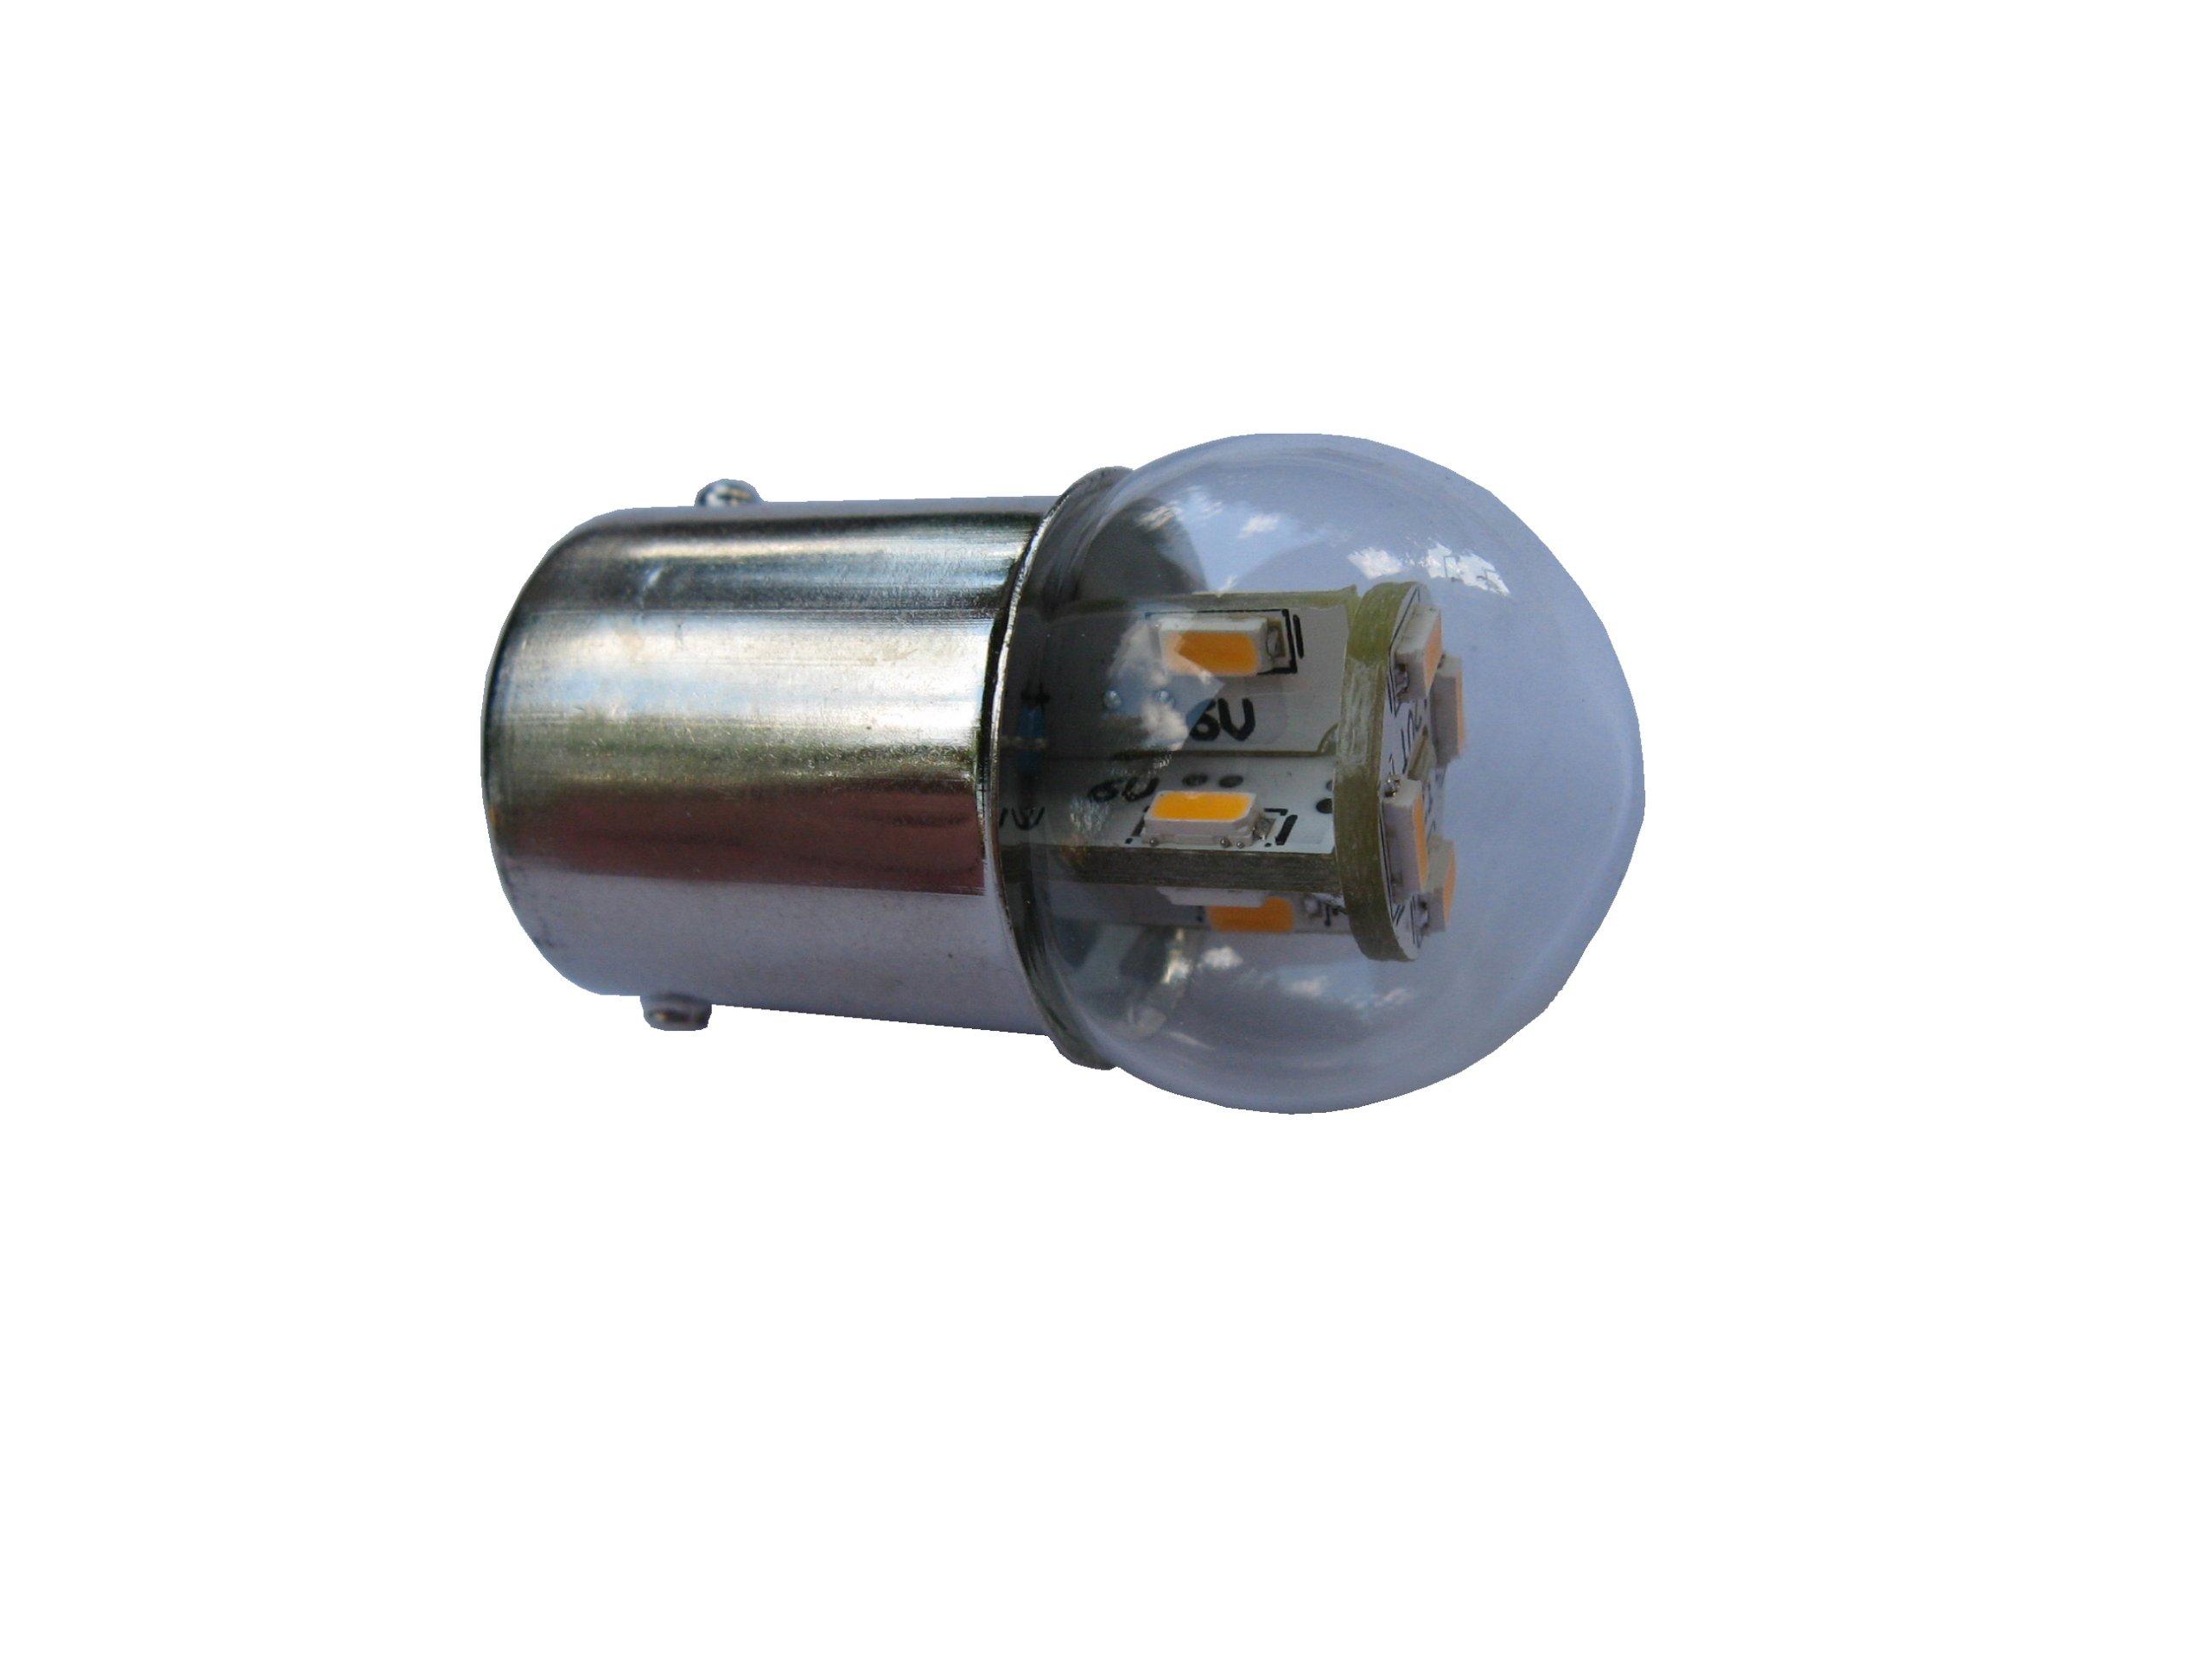 THE LAMP LED LT BA15S 12V AC DC 5W 10W POSITION